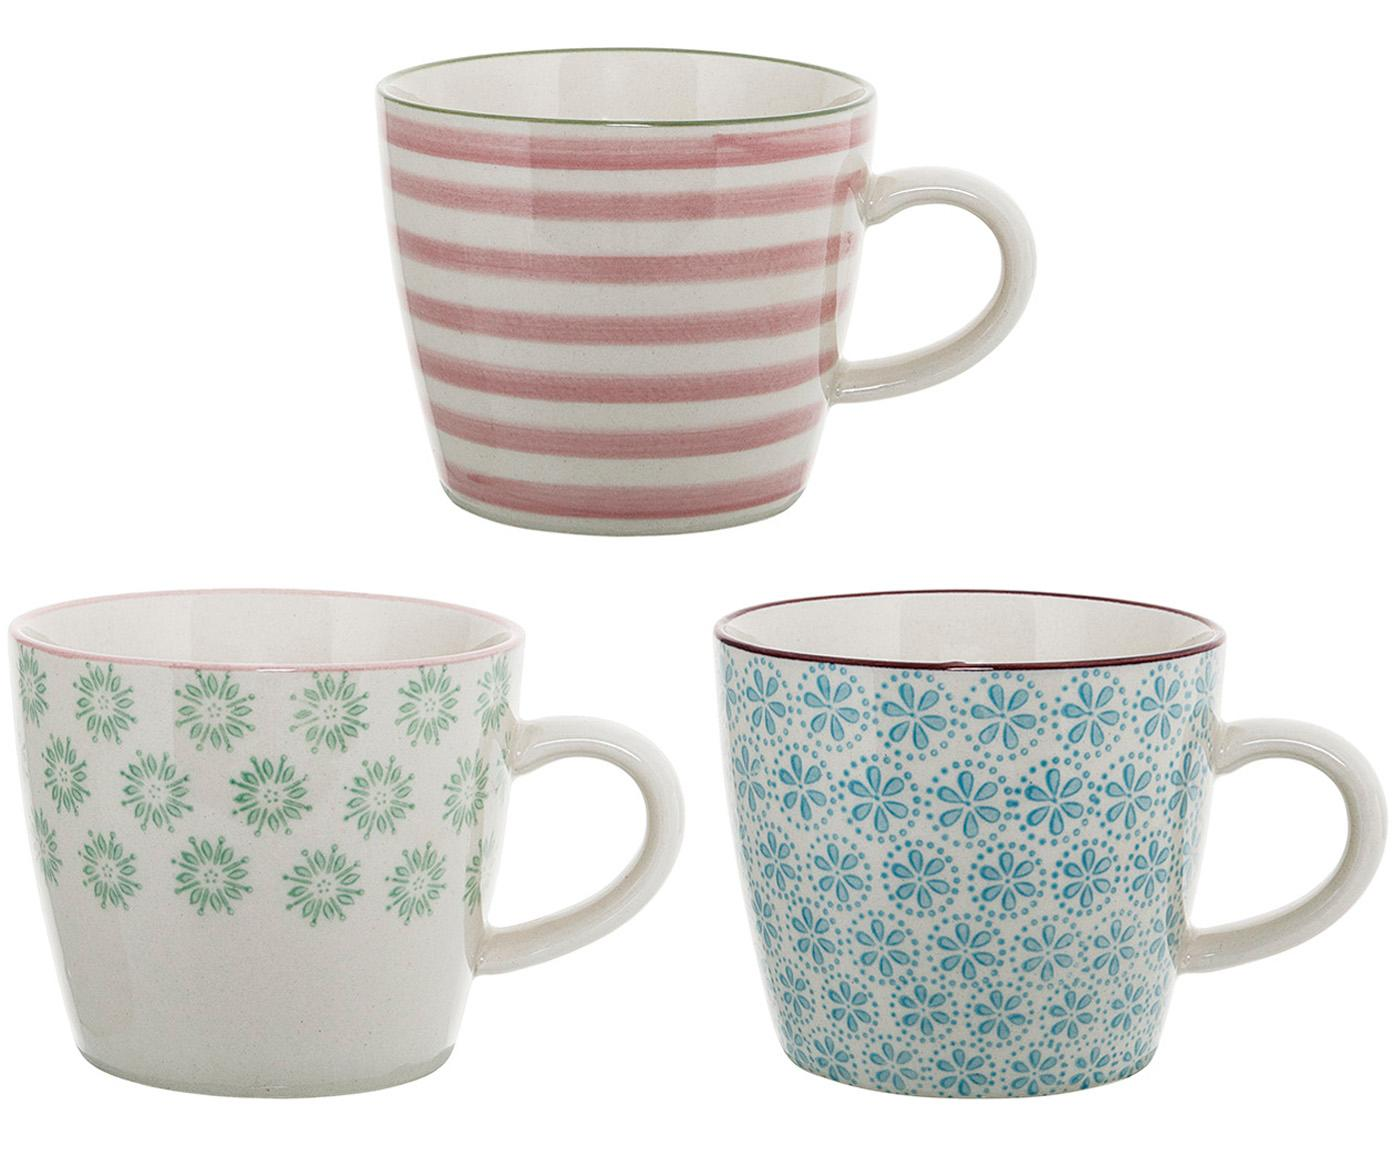 Set de tazas Patrizia, 3pzas., Gres, Blanco, verde, azul, rojo, Ø 10 x Al 8 cm